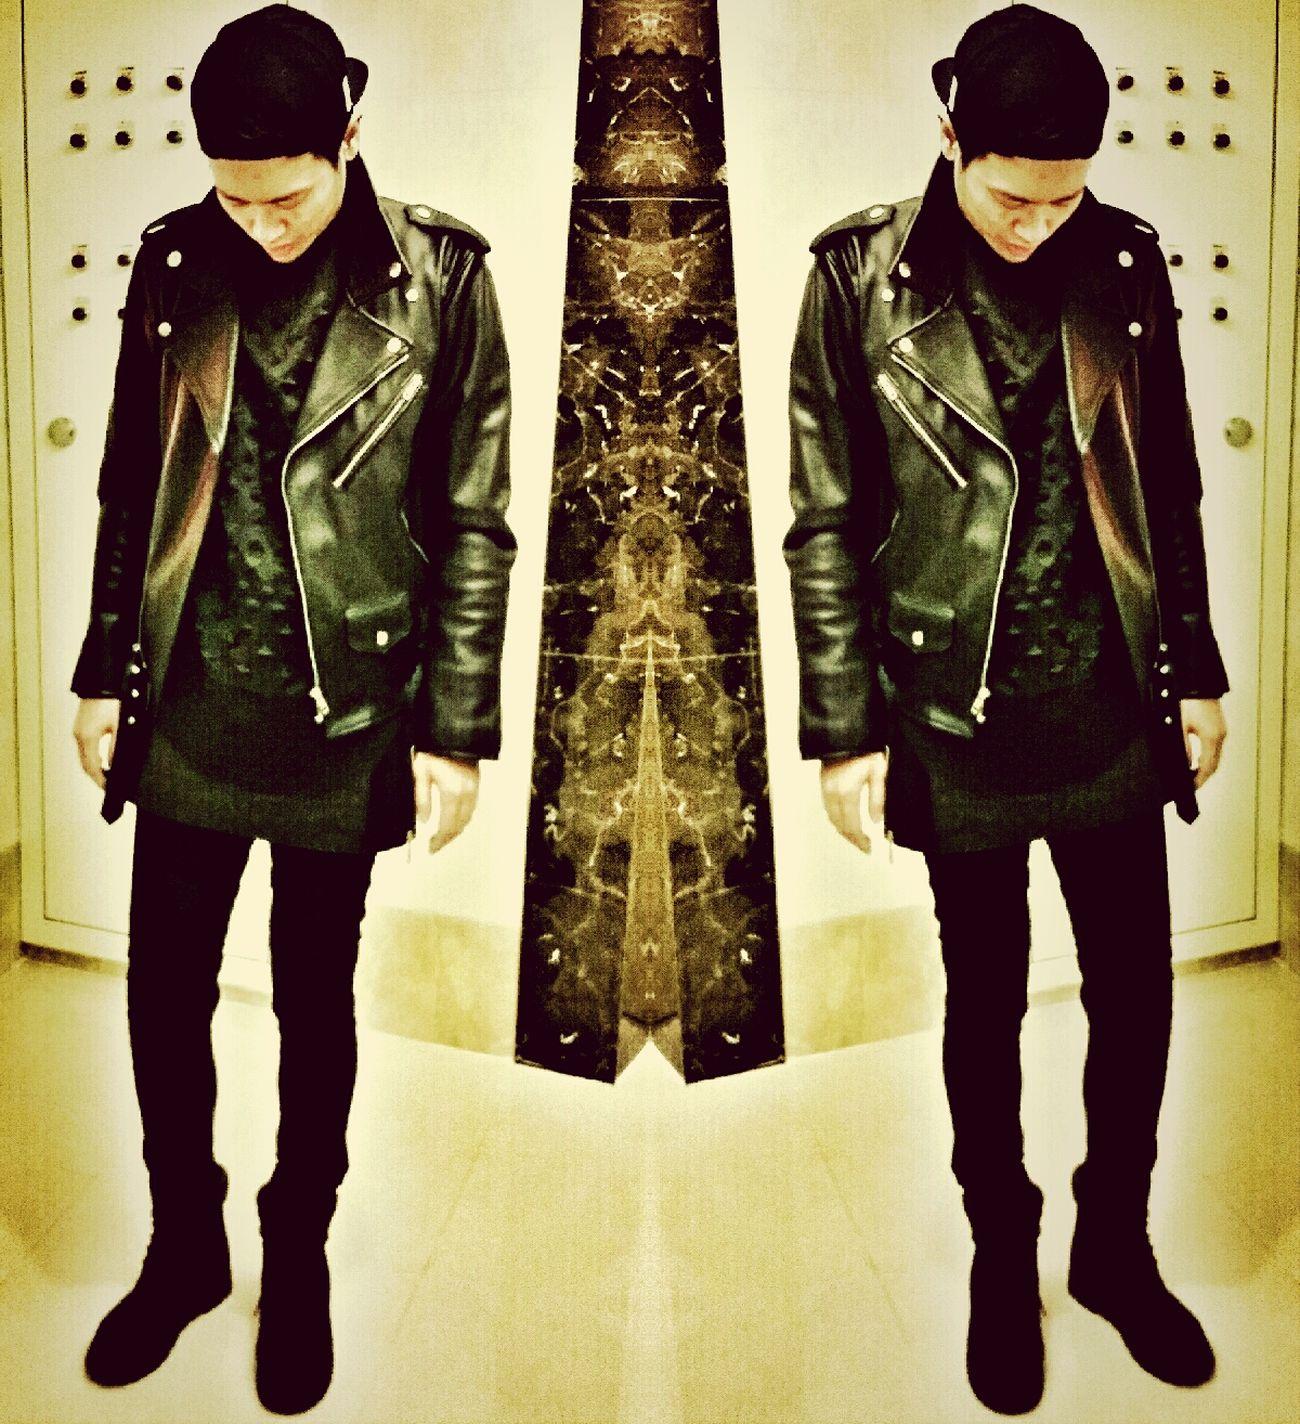 Street Fashion Fashion Outfit That's Me